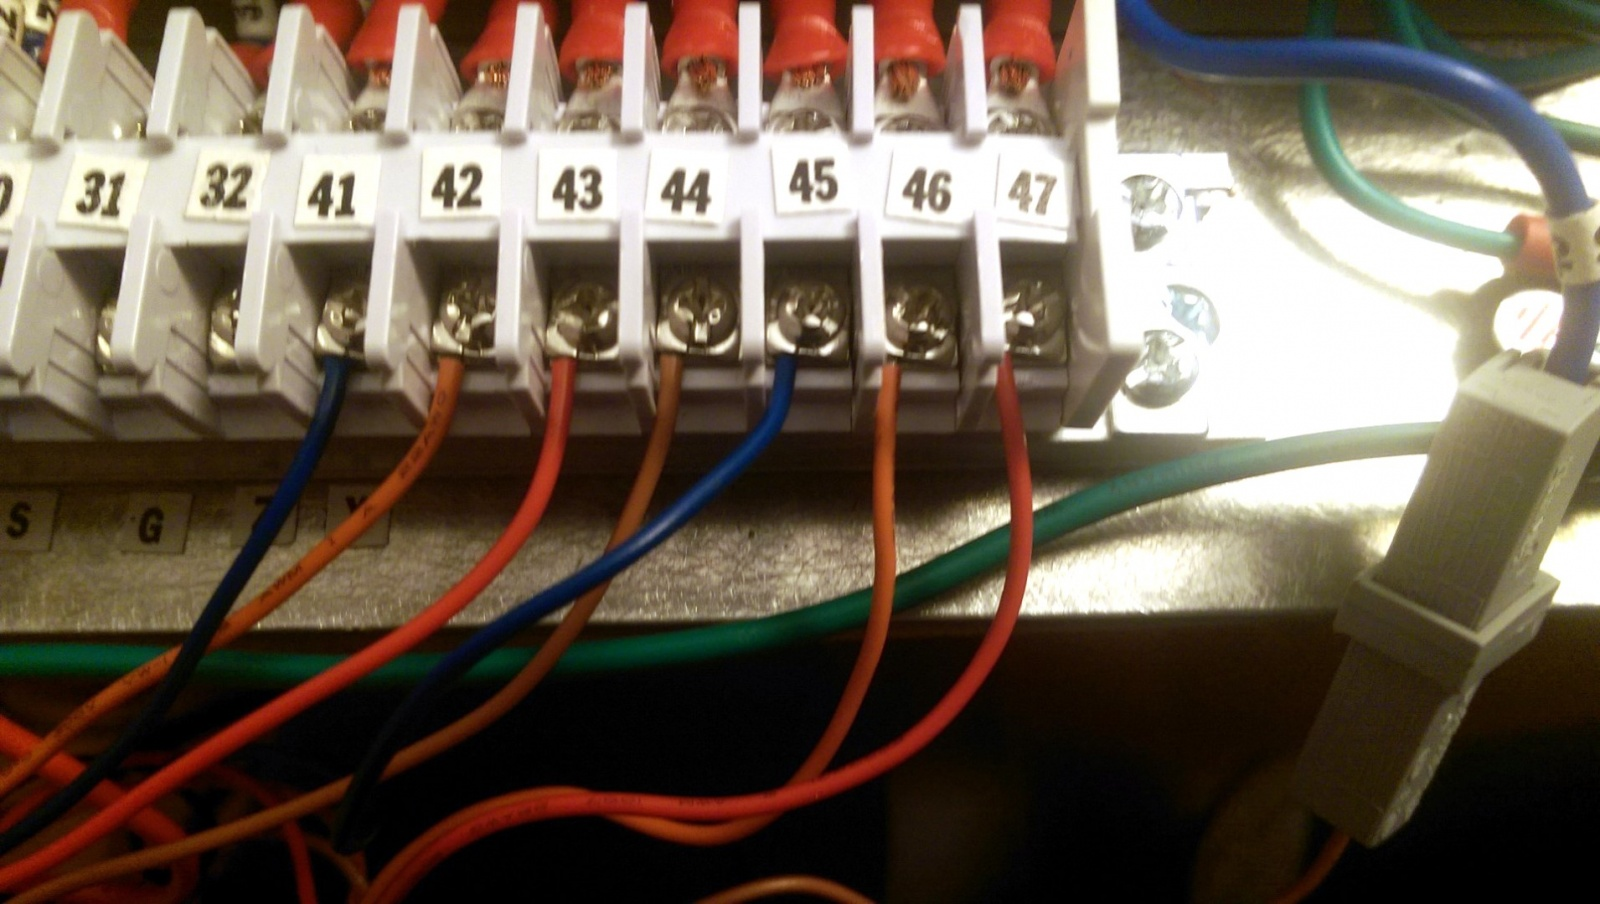 Модернизация токарного станка под работу с ЧПУ - 10